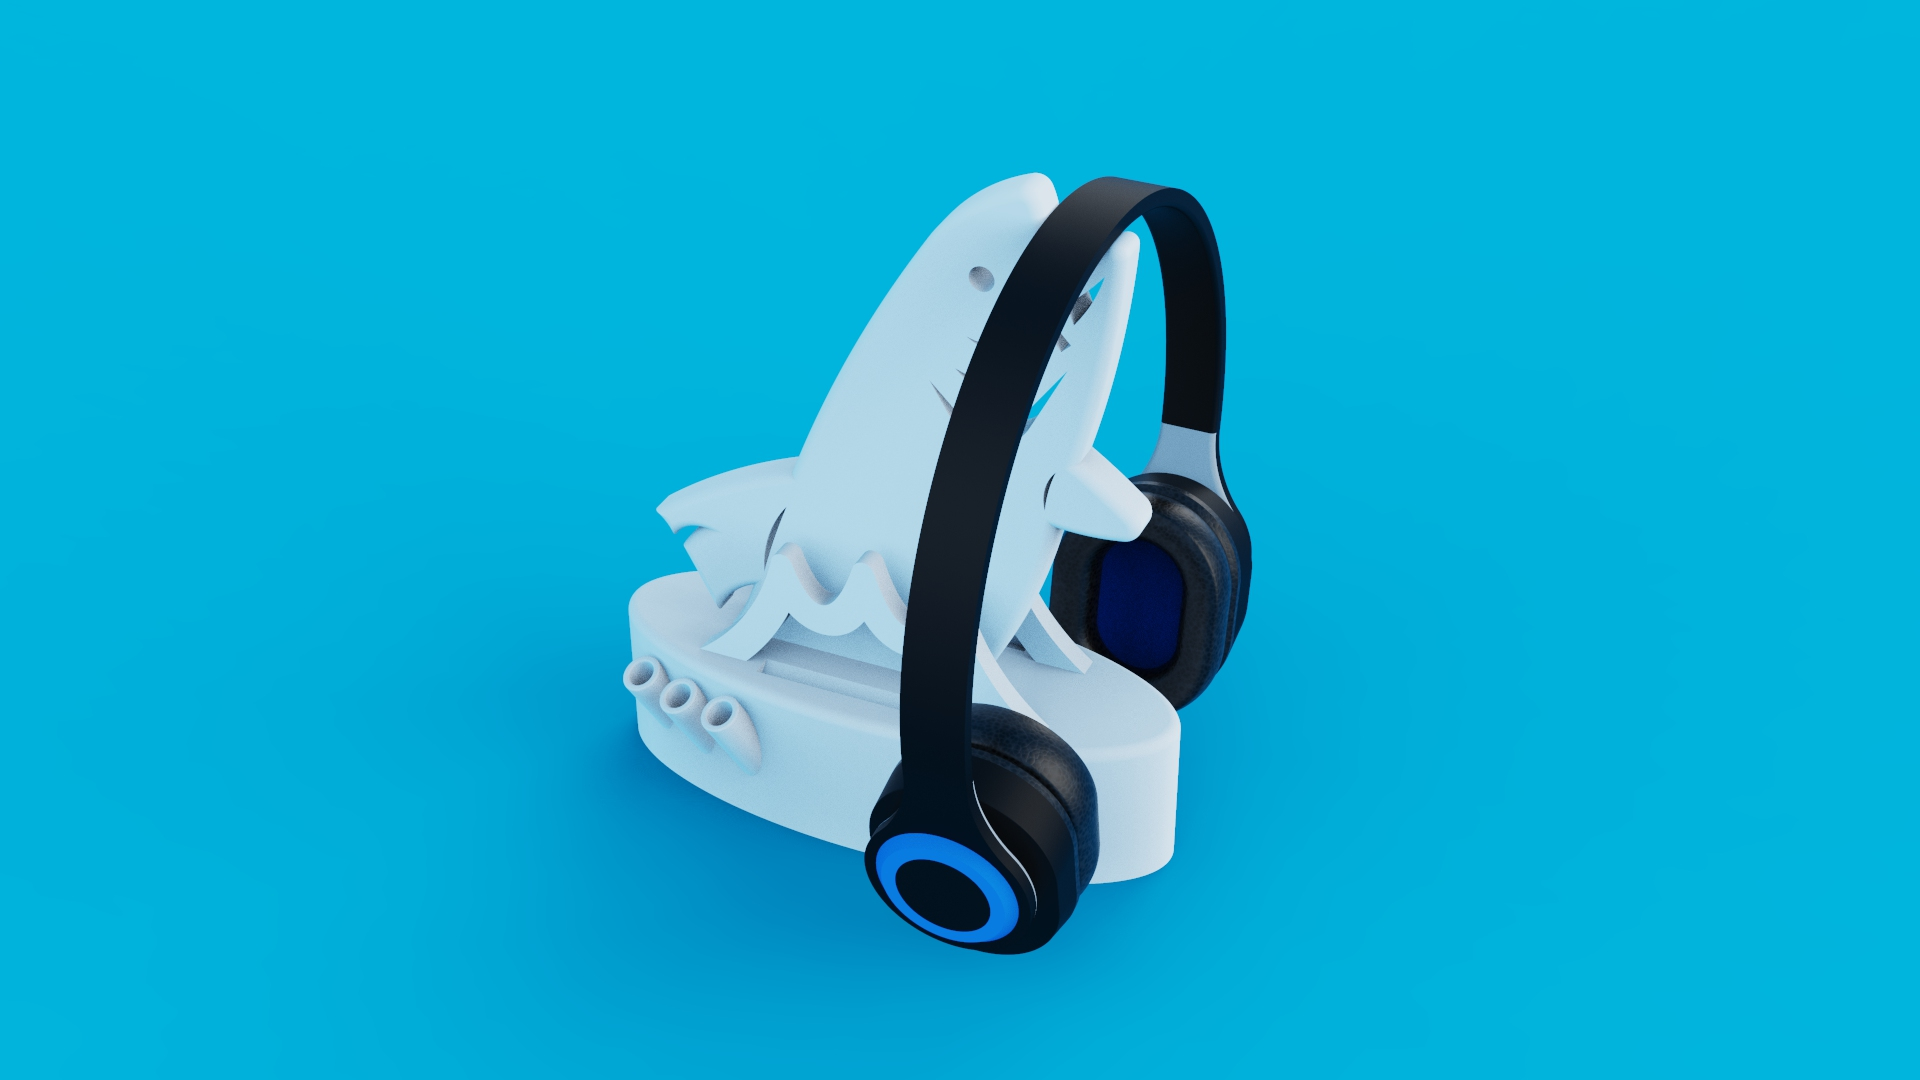 Fish_Headphone_Stand_Organiser_KeyShot.jpg Download free STL file Fish Headphone Stand Organiser • 3D printing model, inProgressDesigns